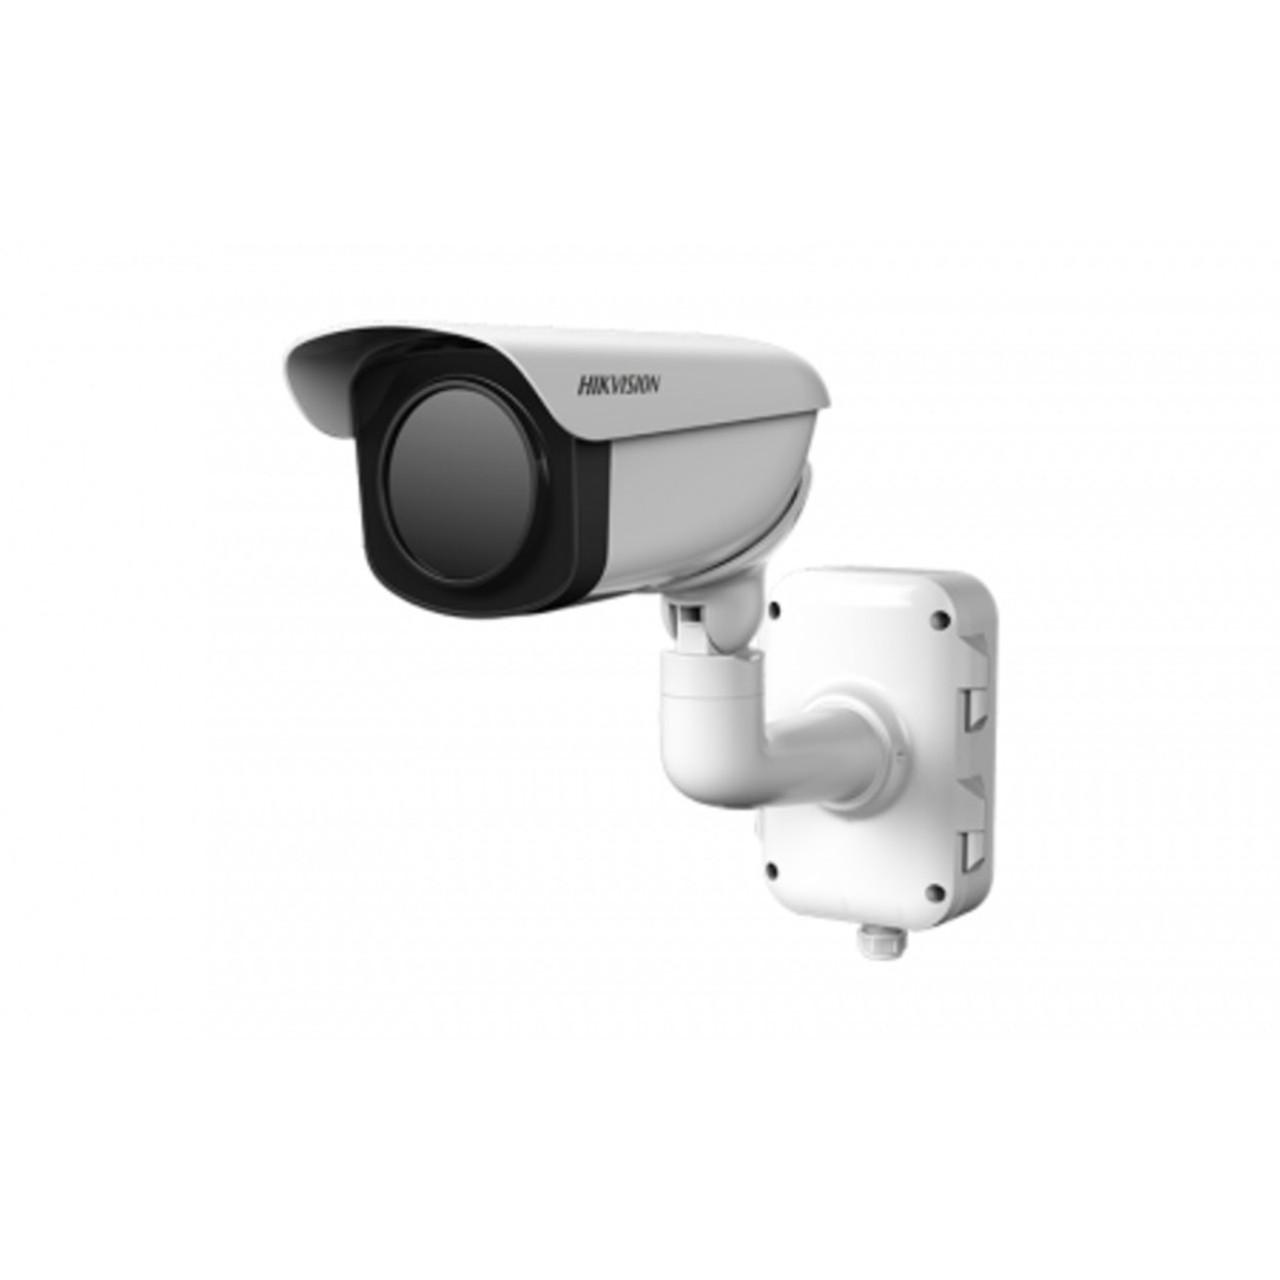 Hikvision 6.2mm Lens Thermal Optical Bi-Spectrum Bullet CCTV Security Camera